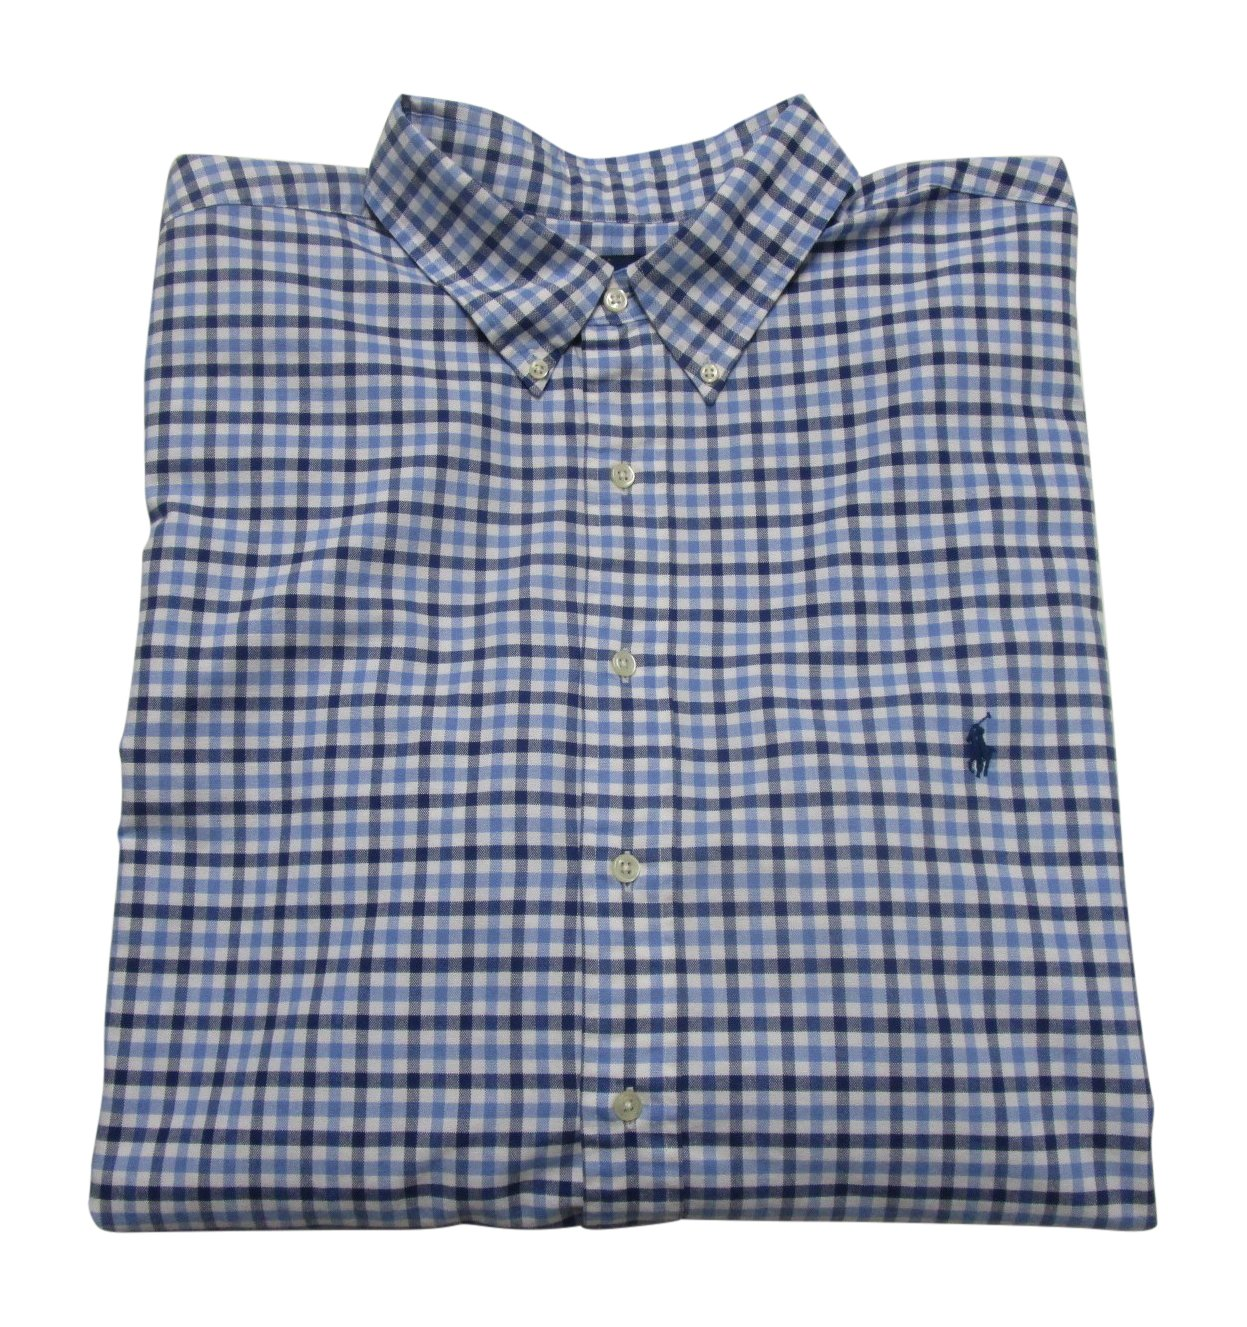 RALPH LAUREN Mens' Big and Tall Long Sleeve Plaid Oxford Sport Shirt (3XLT, Blue/Navy Check)